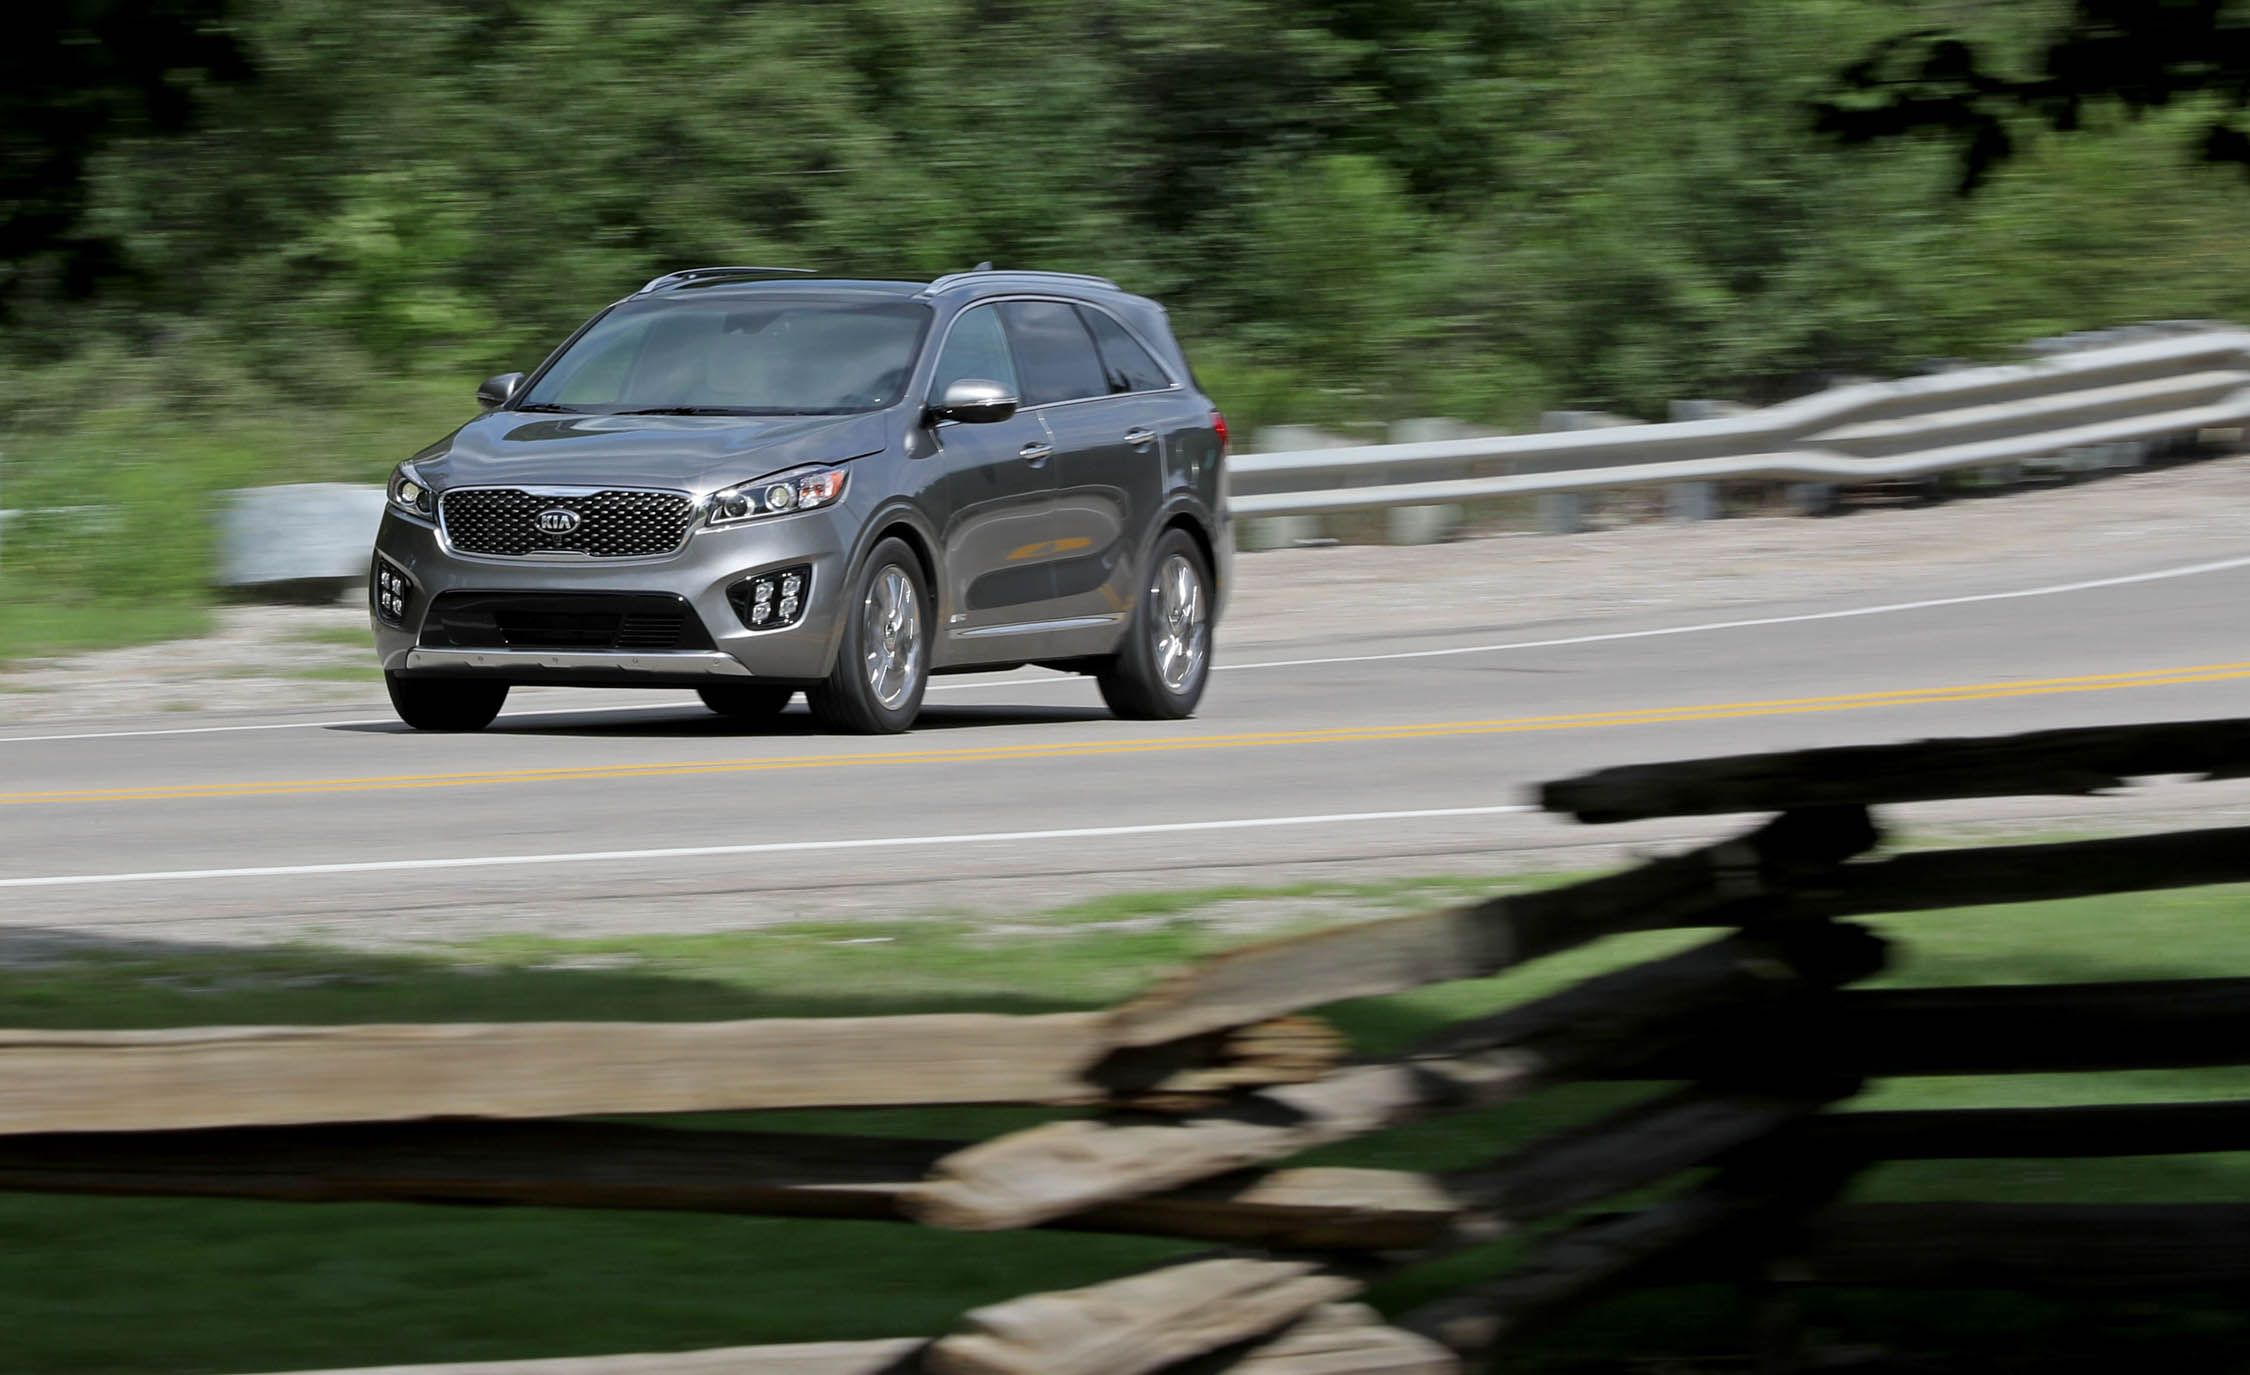 Kia Sorento: Front seat adjustment - power (if equipped)